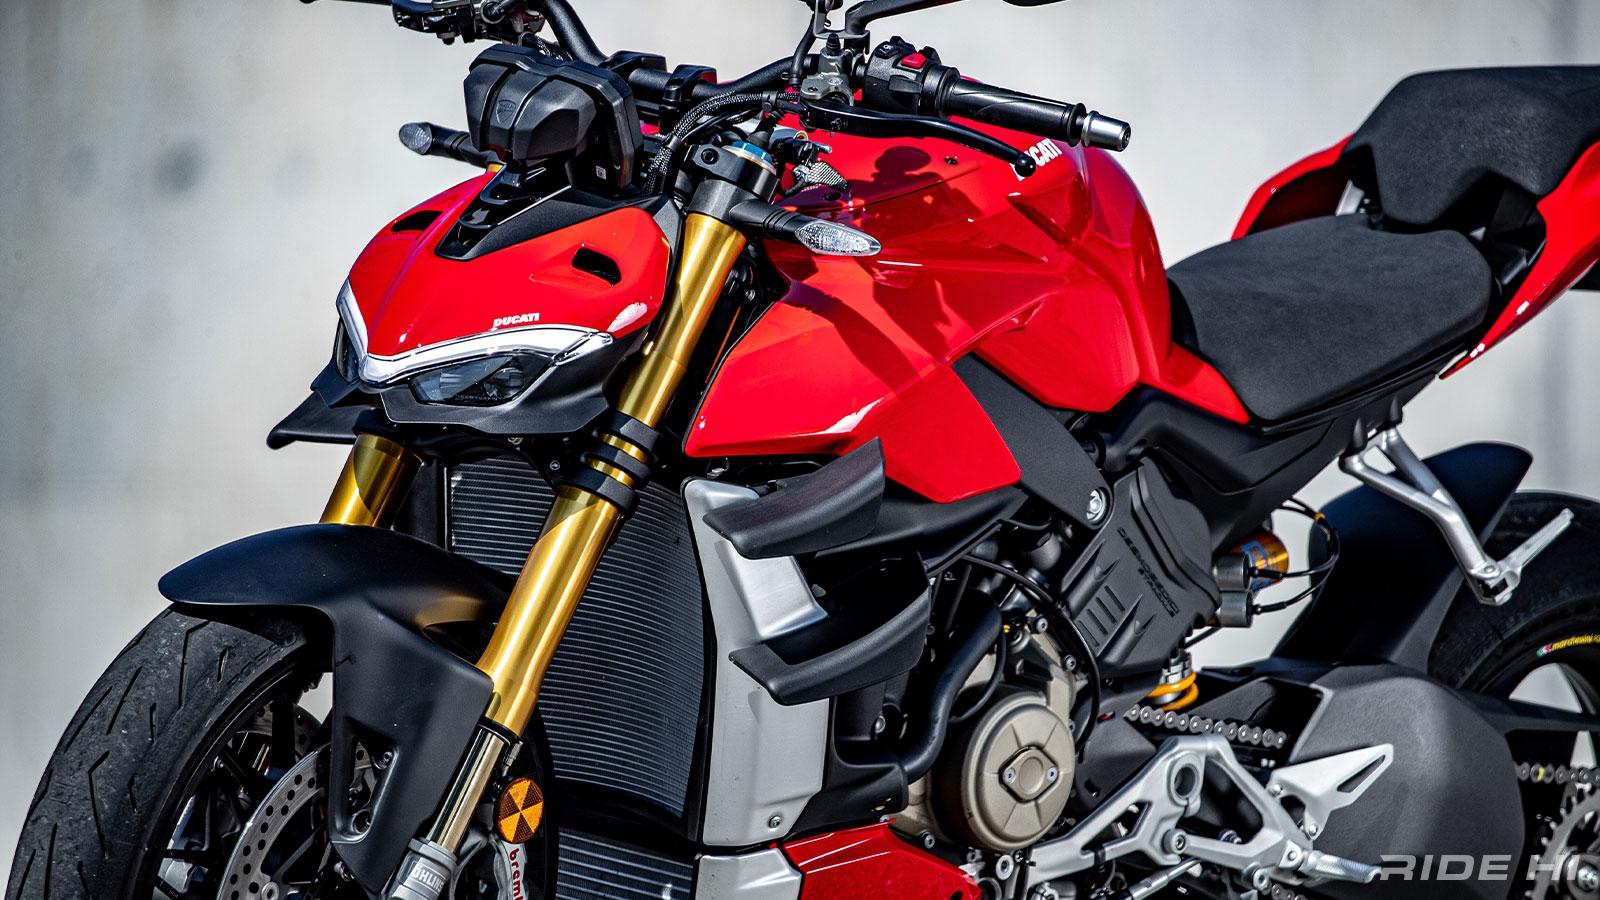 Bi mat dang sau nhung canh gio winglet tren MotoGP - 5